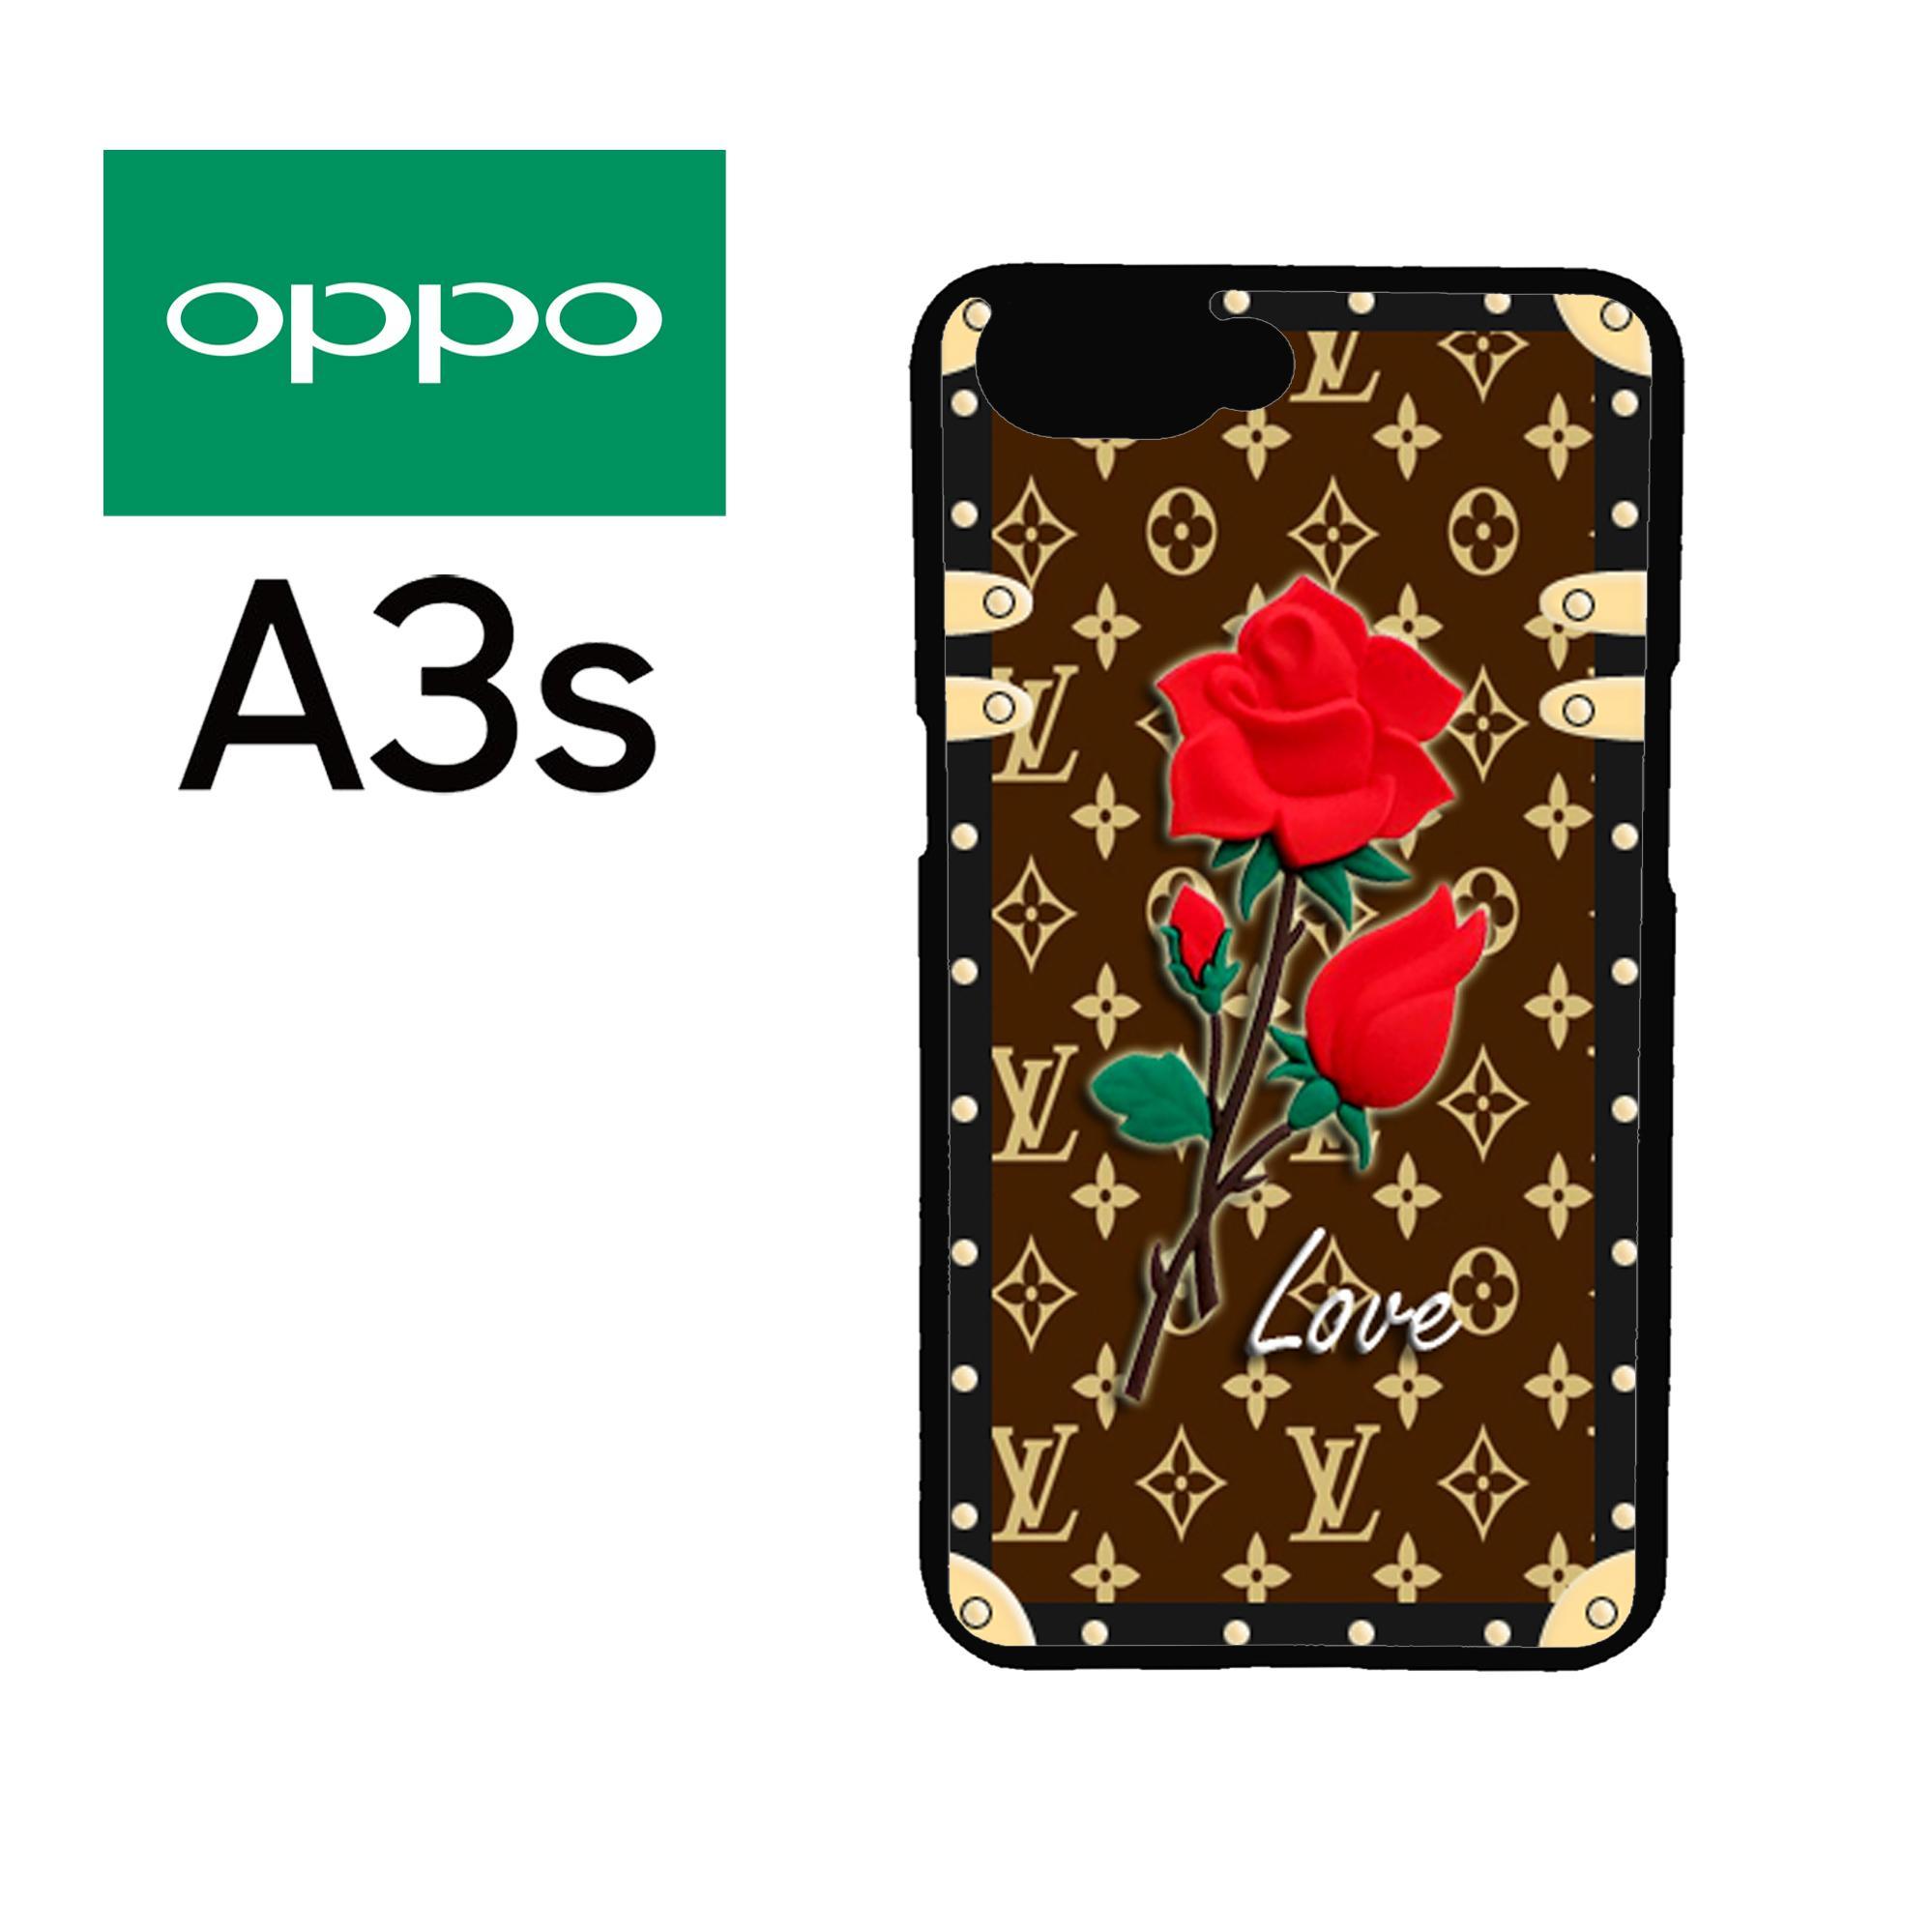 Rajamurah fashion printing case Oppo A3s - 006